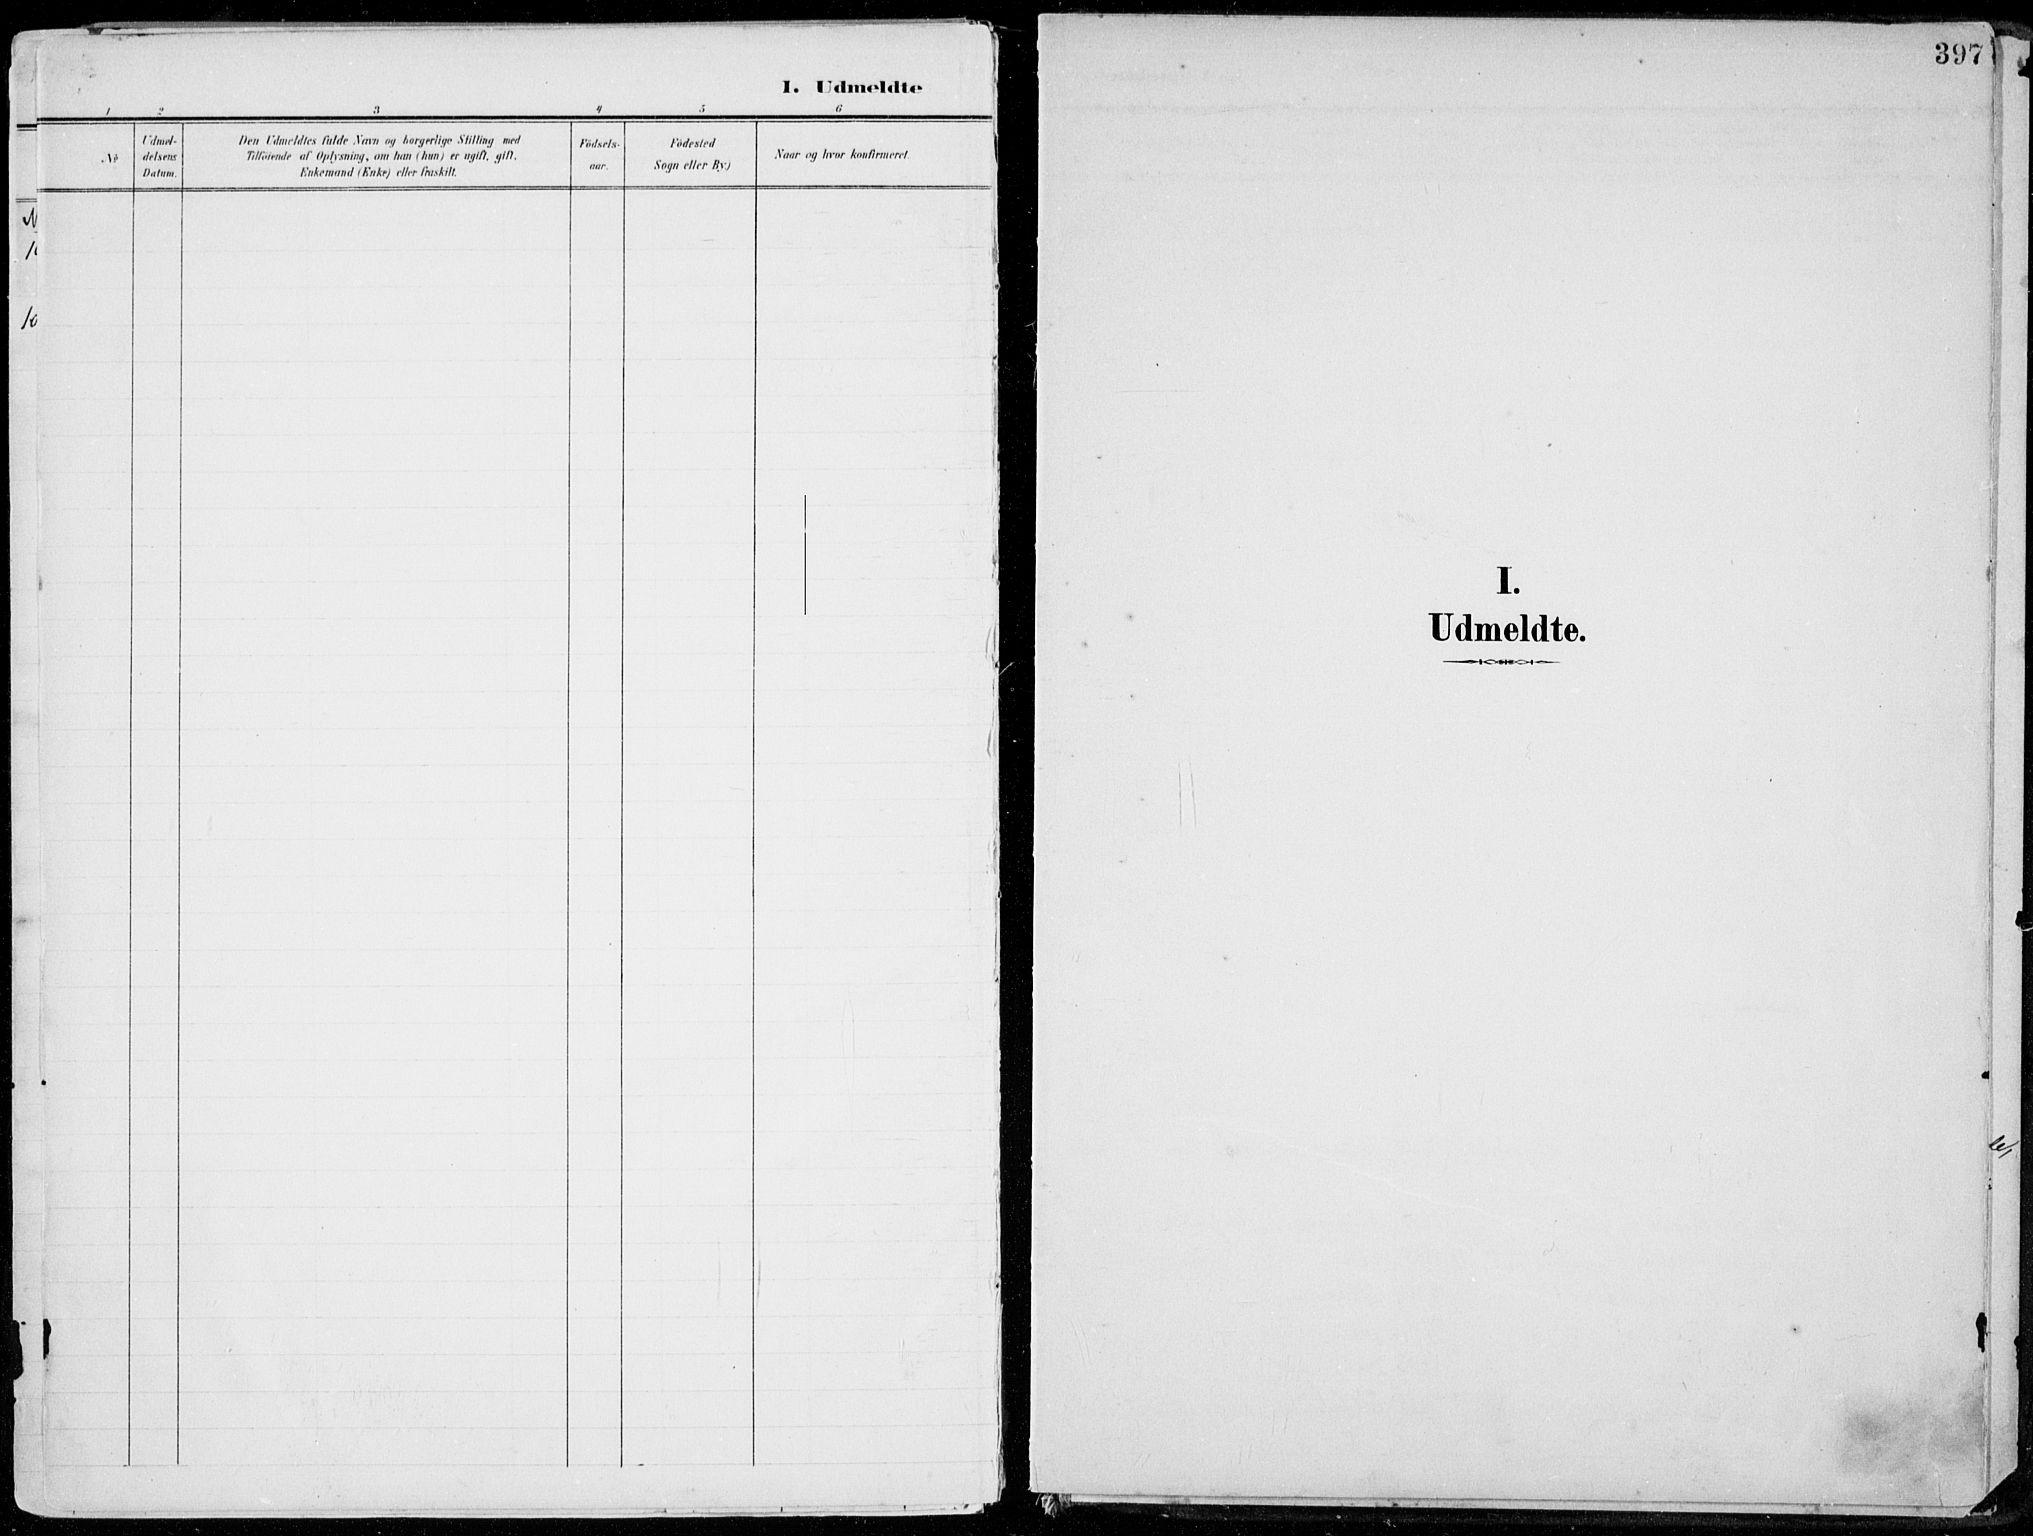 SAH, Lillehammer prestekontor, Ministerialbok nr. 1, 1901-1916, s. 397